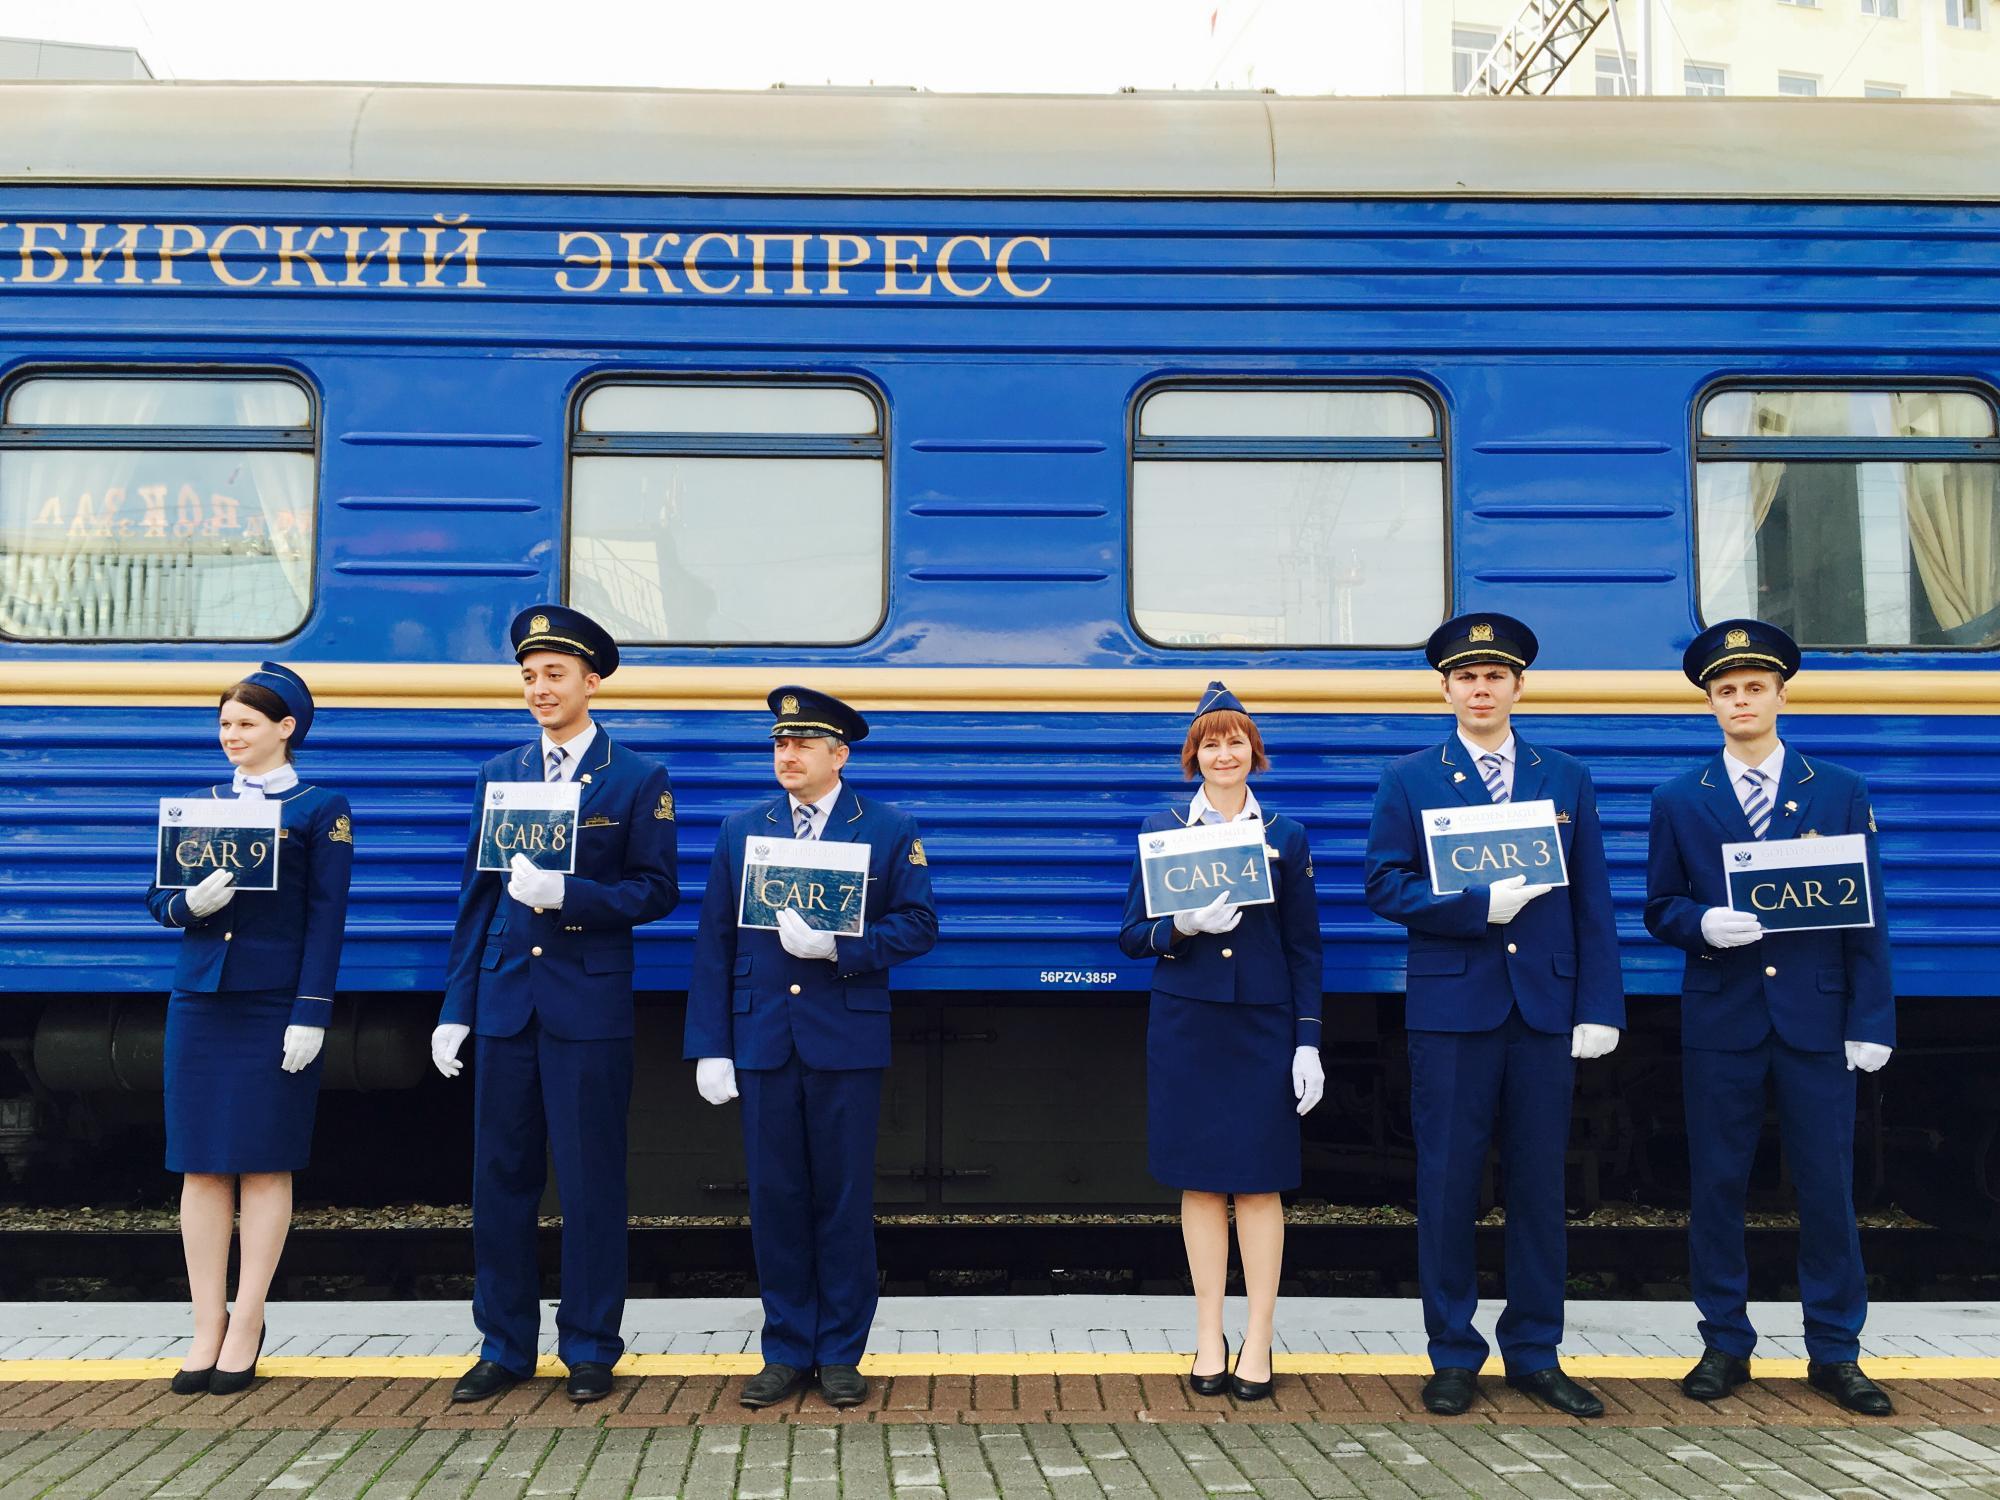 vladivostok siberian express